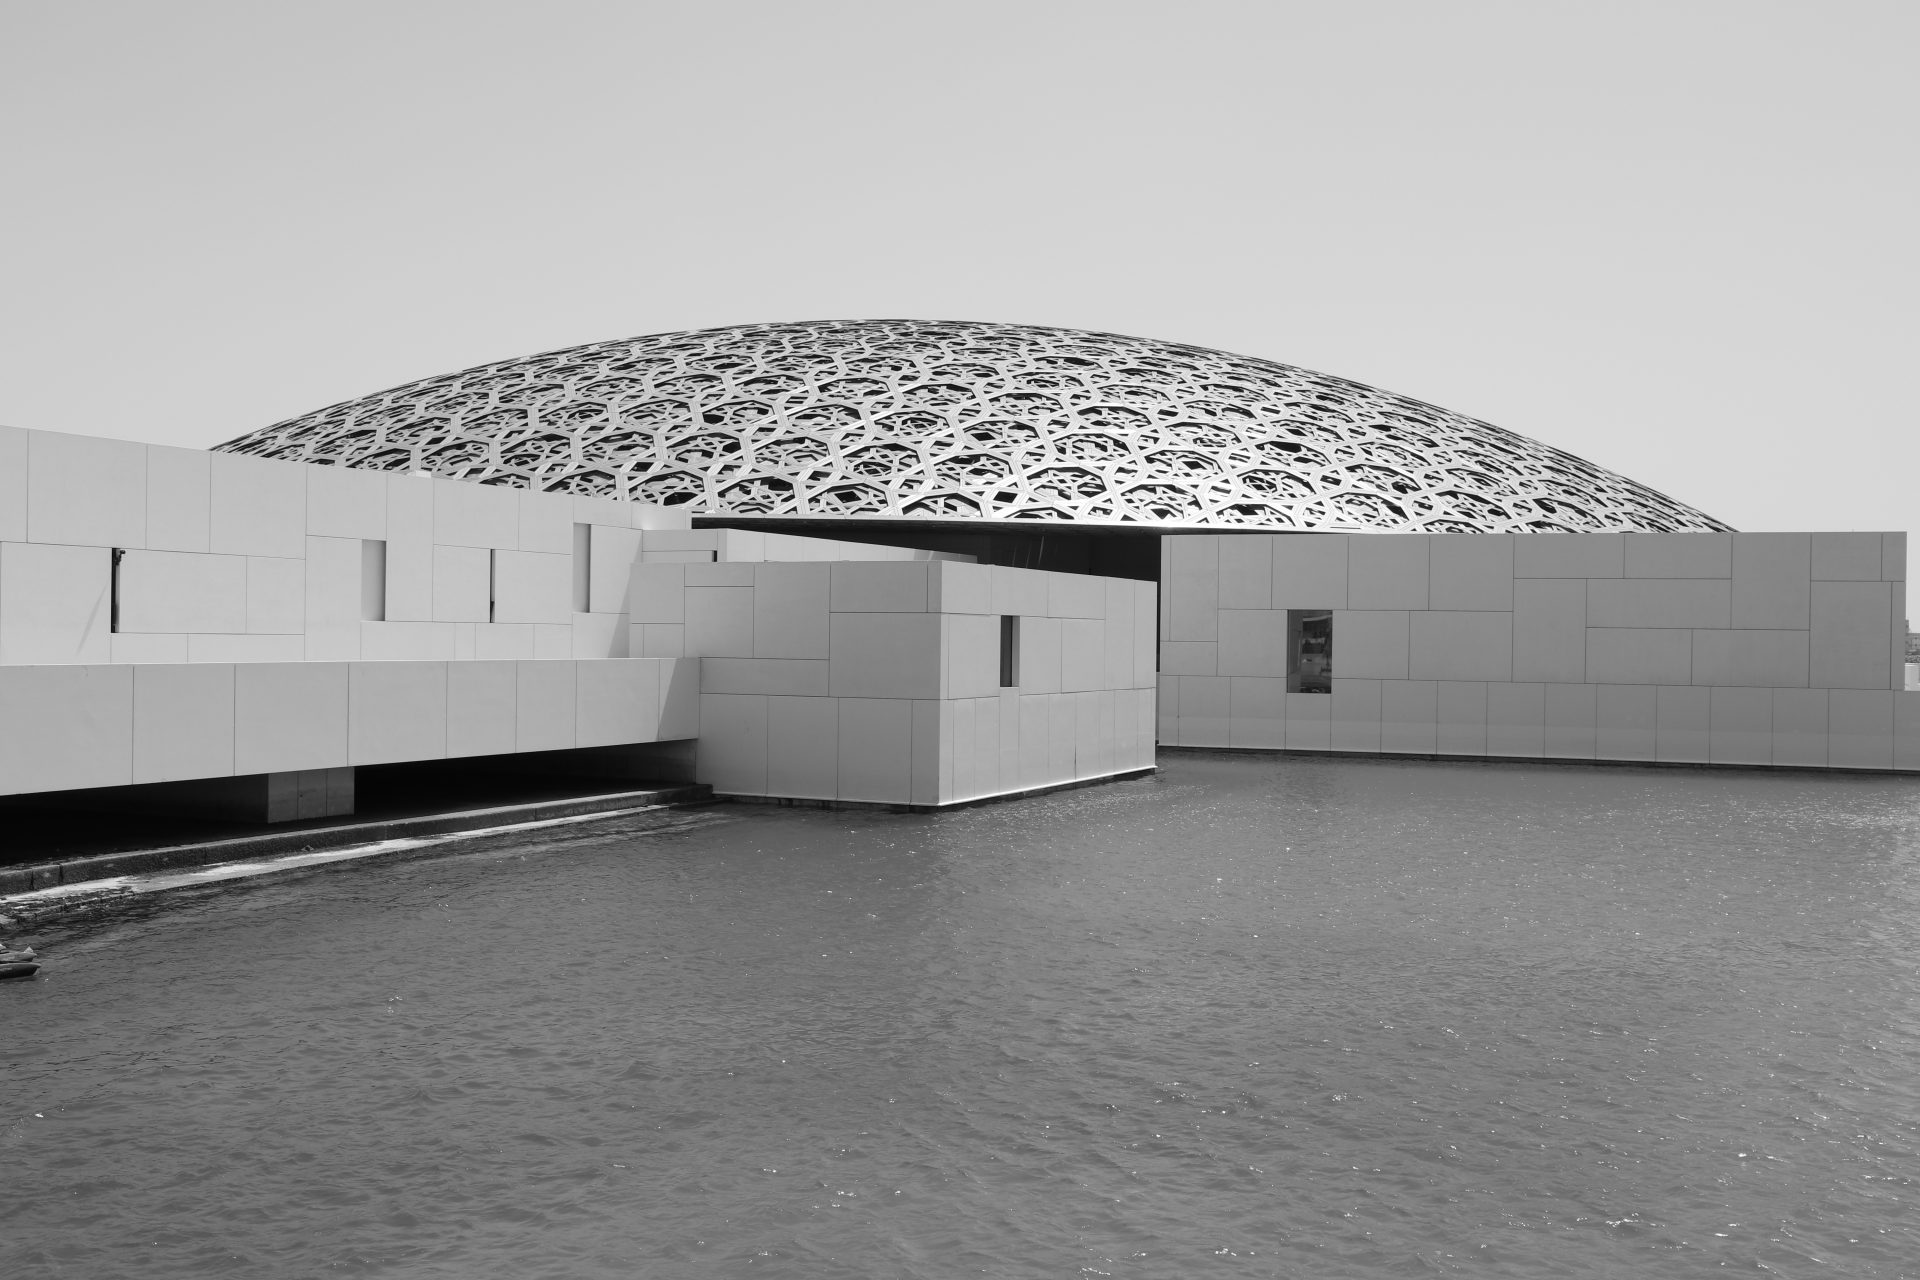 Louvre Abu Dhabi. Entwurf: Ateliers Jean Nouvel. Fertigstellung: 2017.